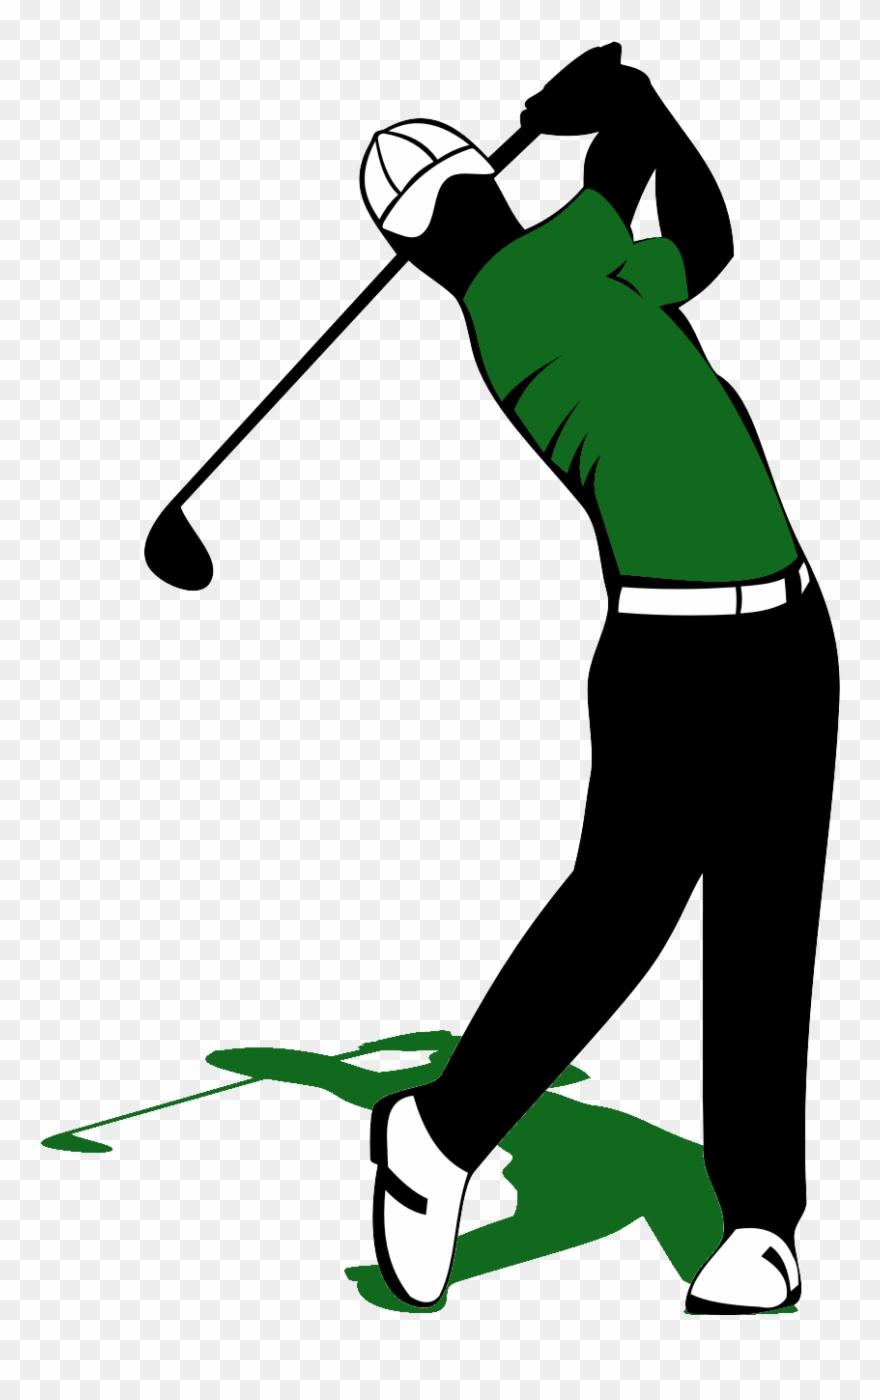 Golf clipart golf swing.  ball pool flames